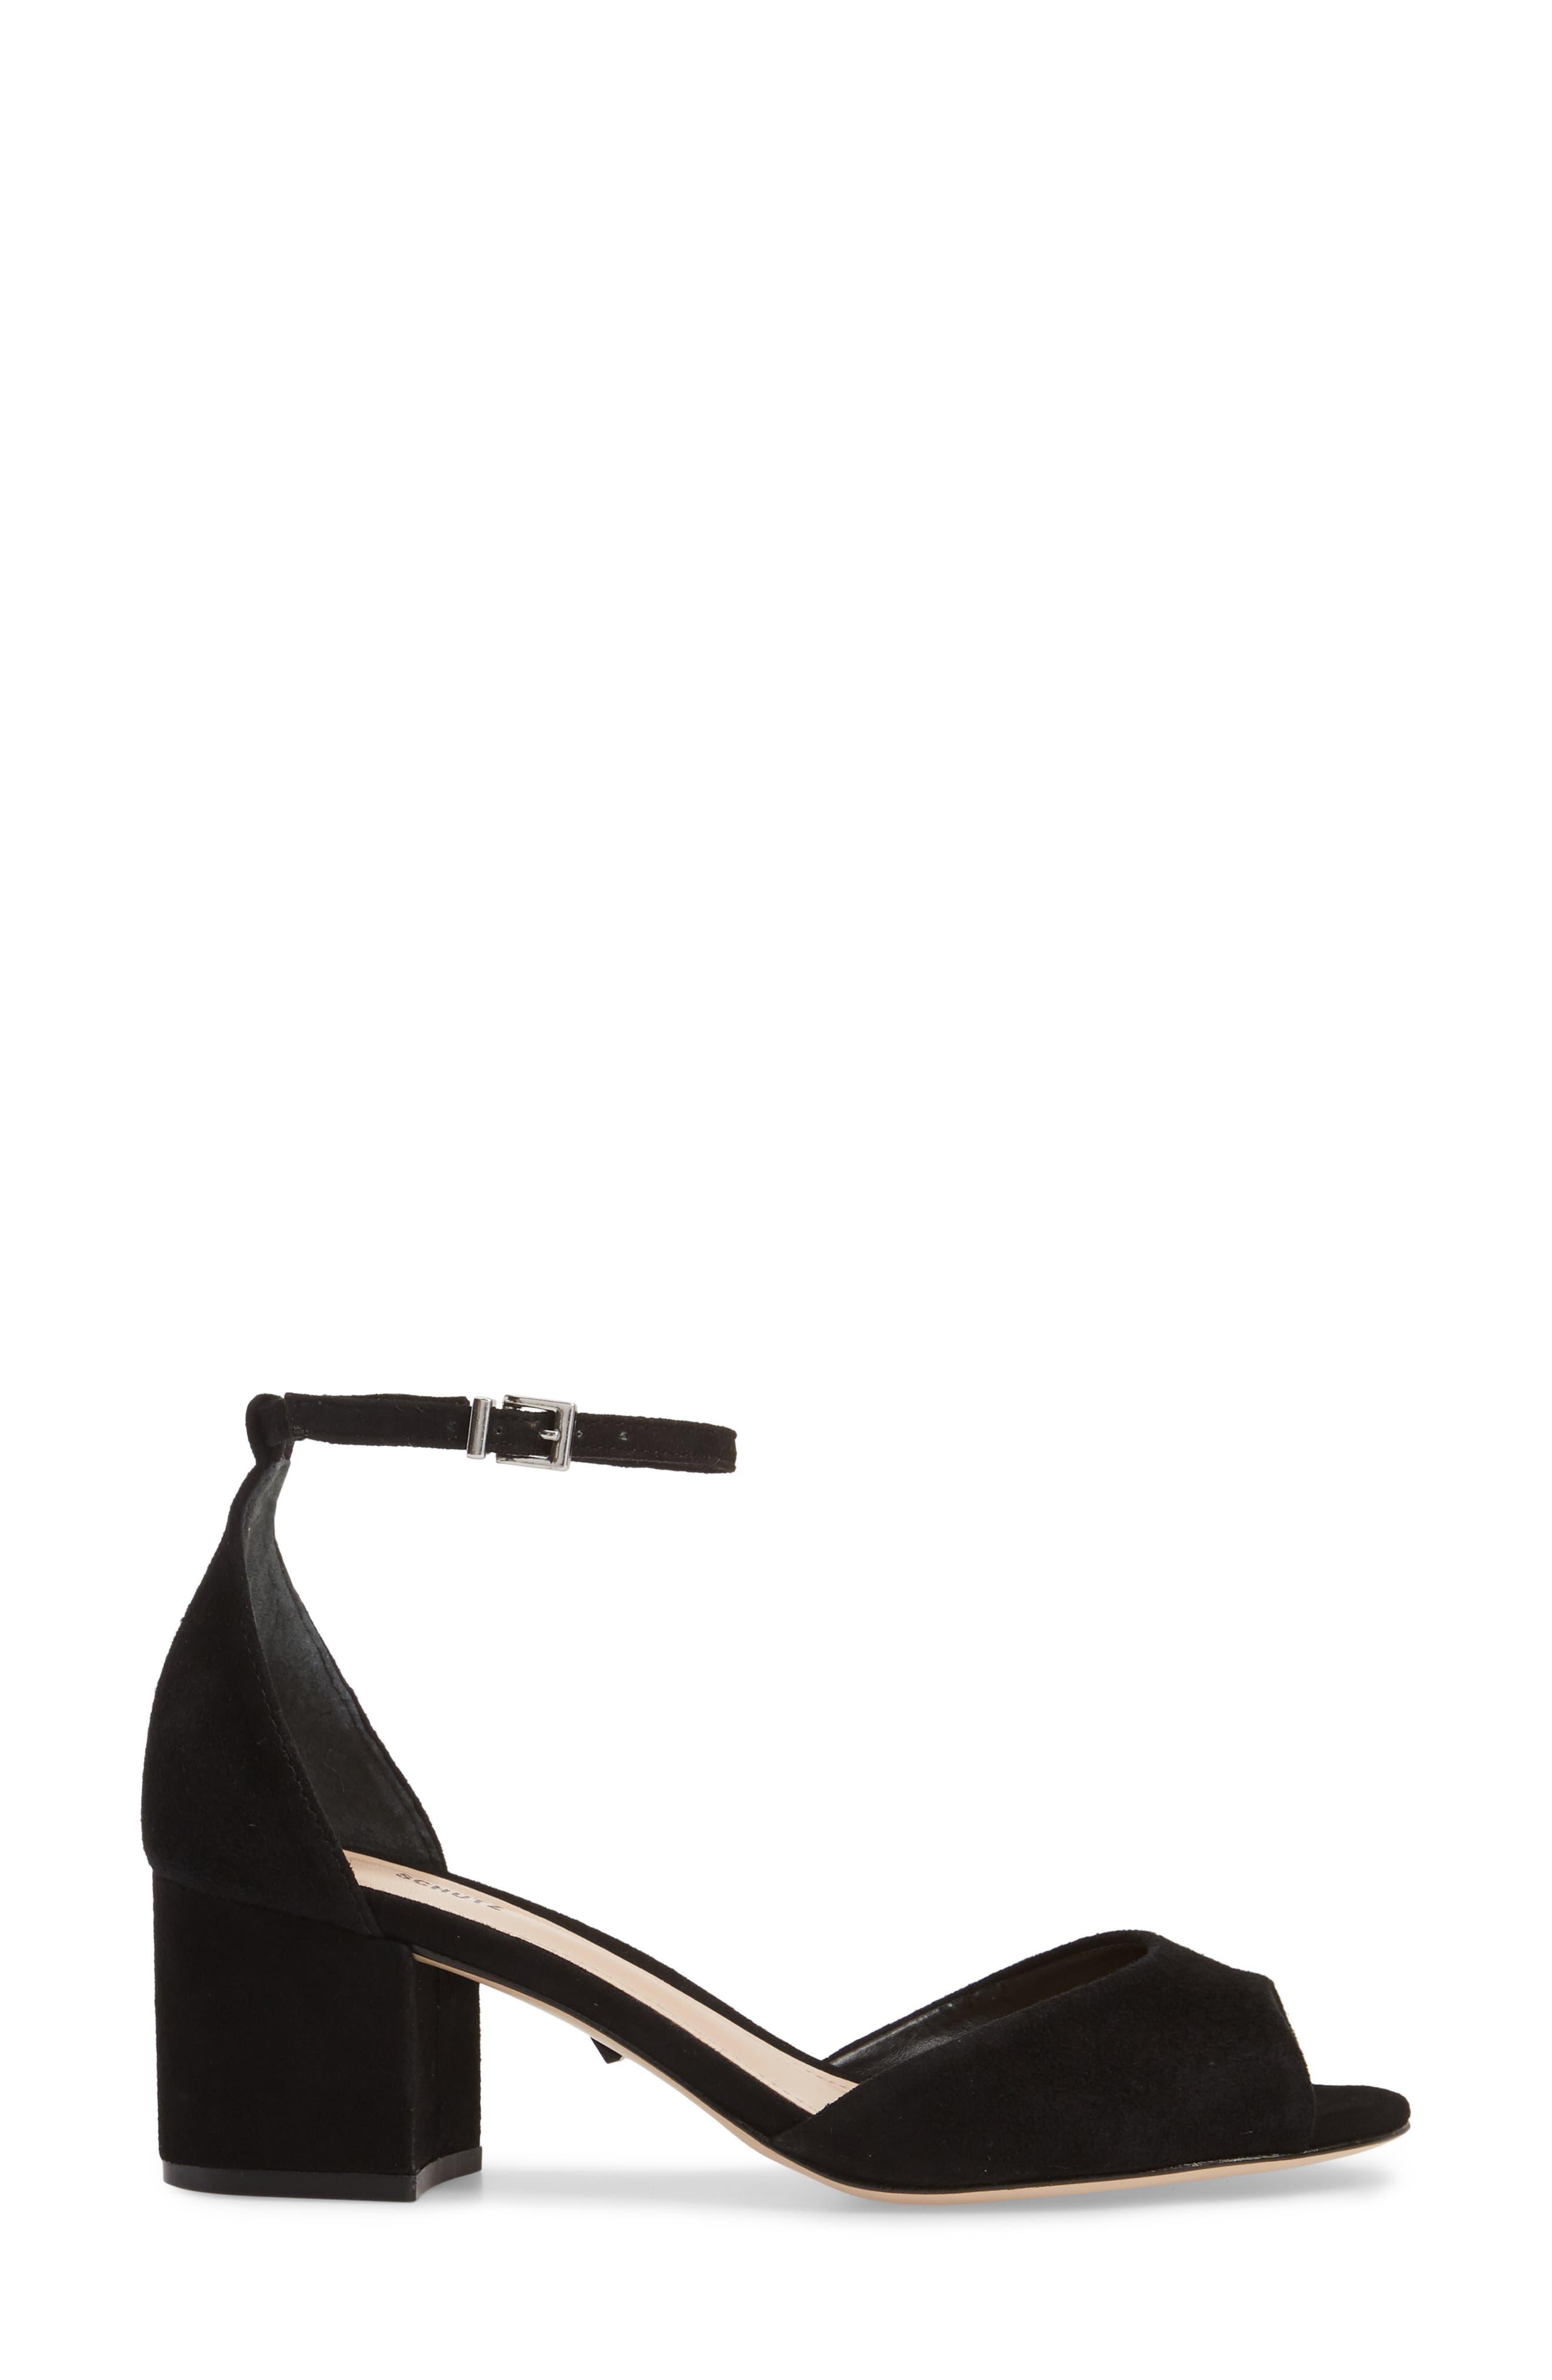 Roama Block Heel Sandal,                             Alternate thumbnail 3, color,                             Black Suede